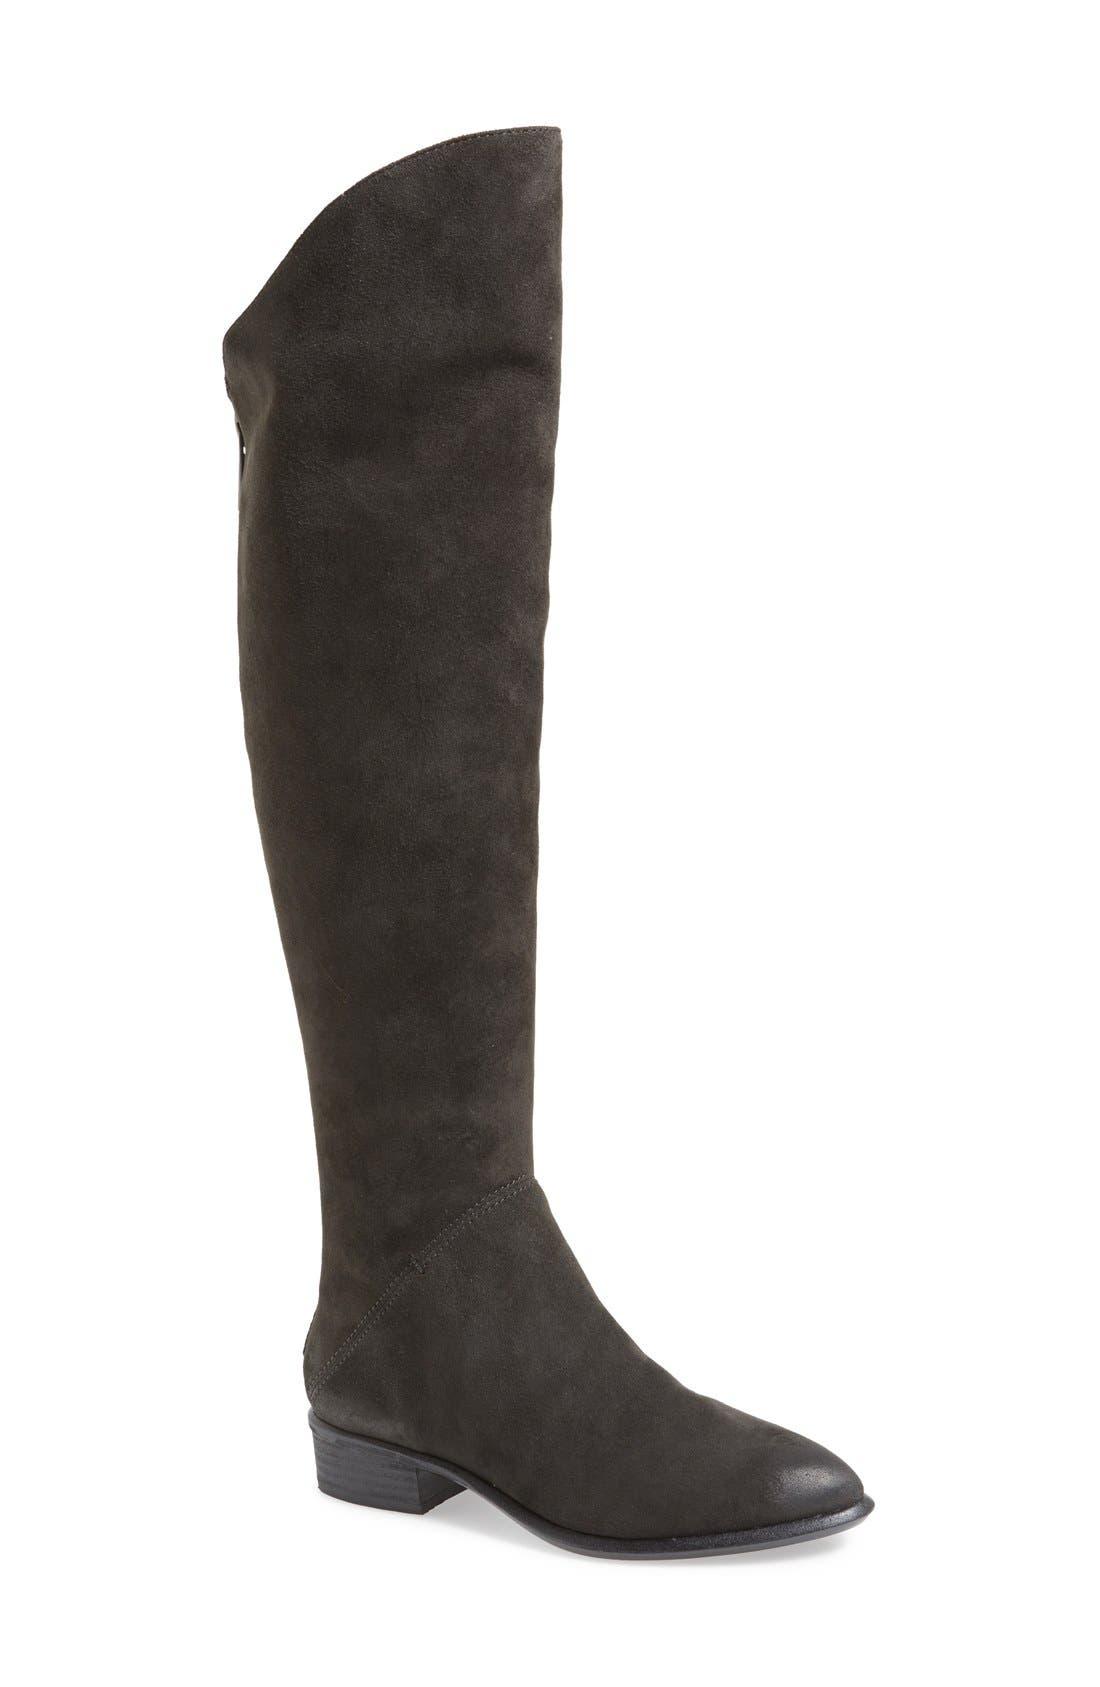 Alternate Image 1 Selected - Dolce Vita 'Meris' Boot (Women)